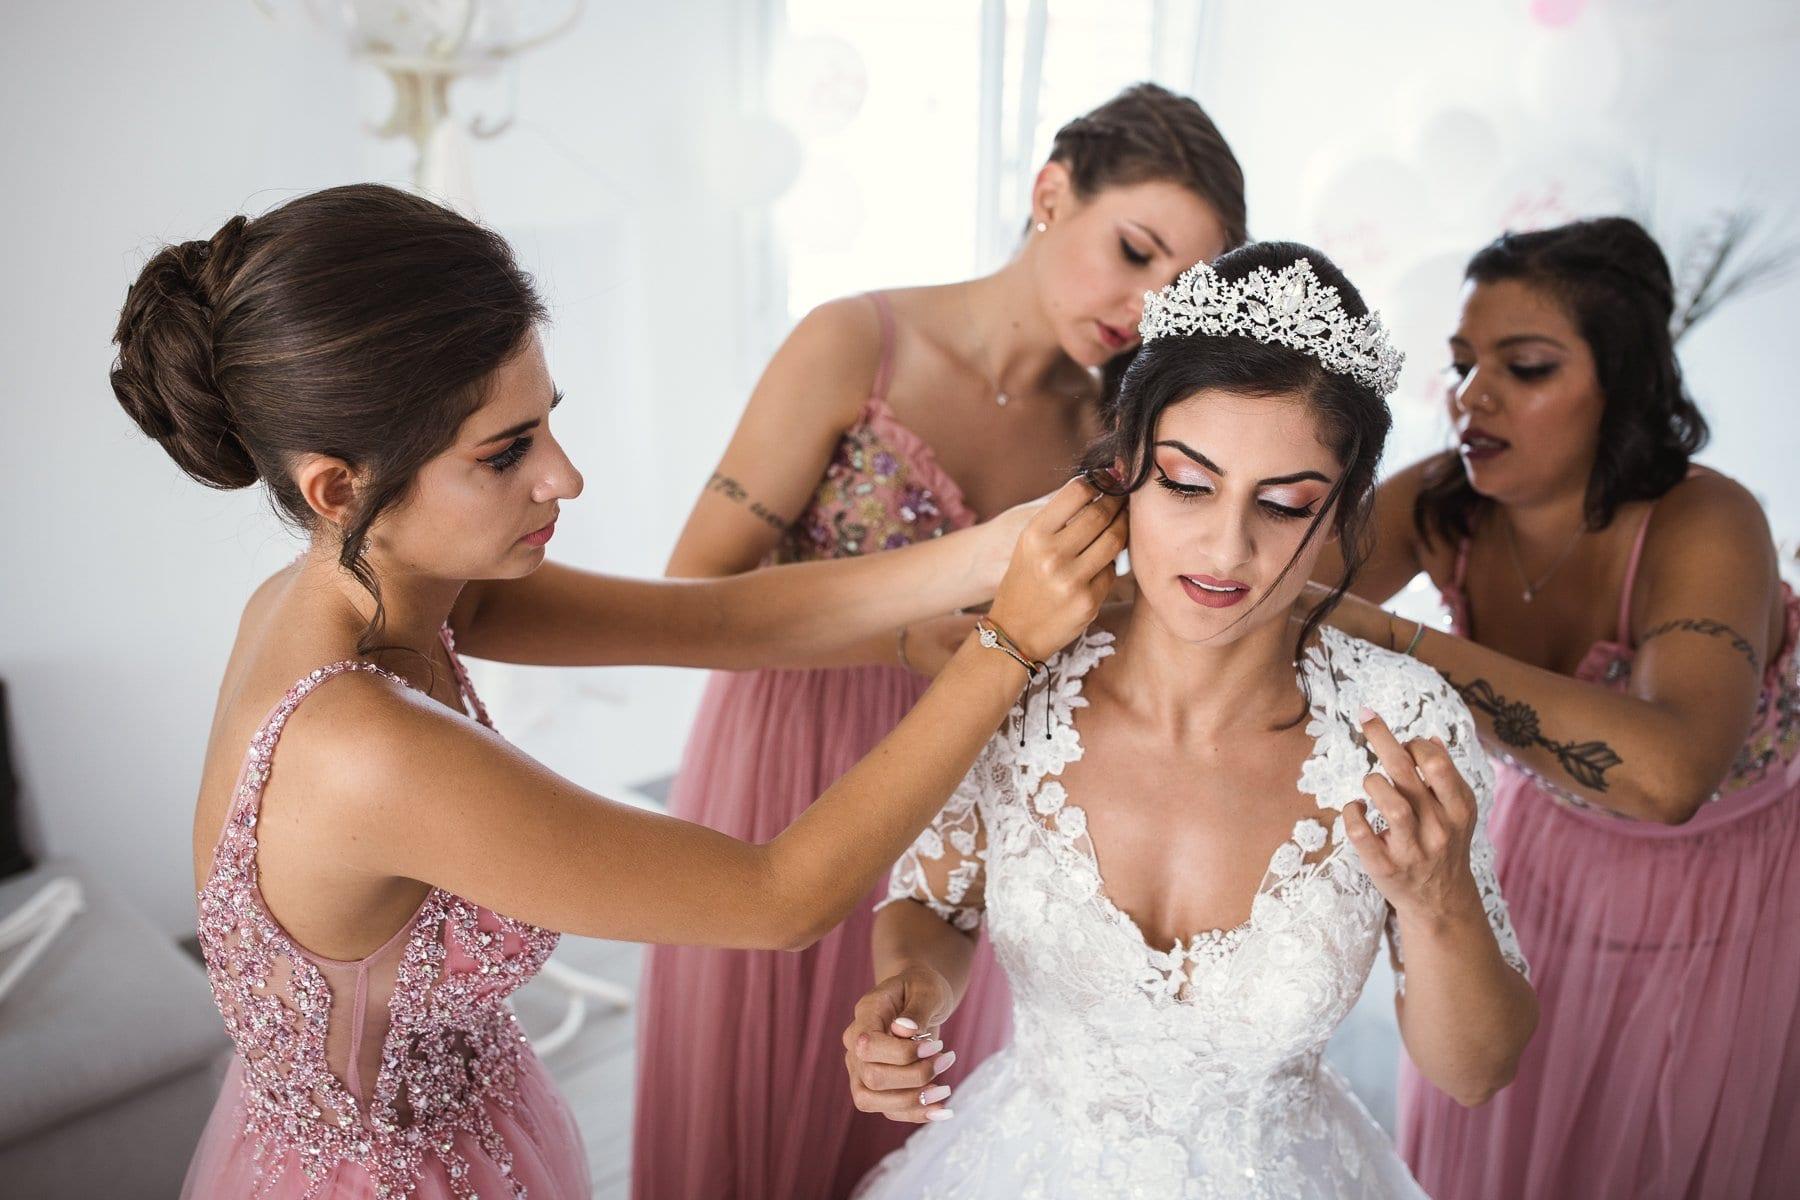 Preparativi sposa aiutata dalle damigelle